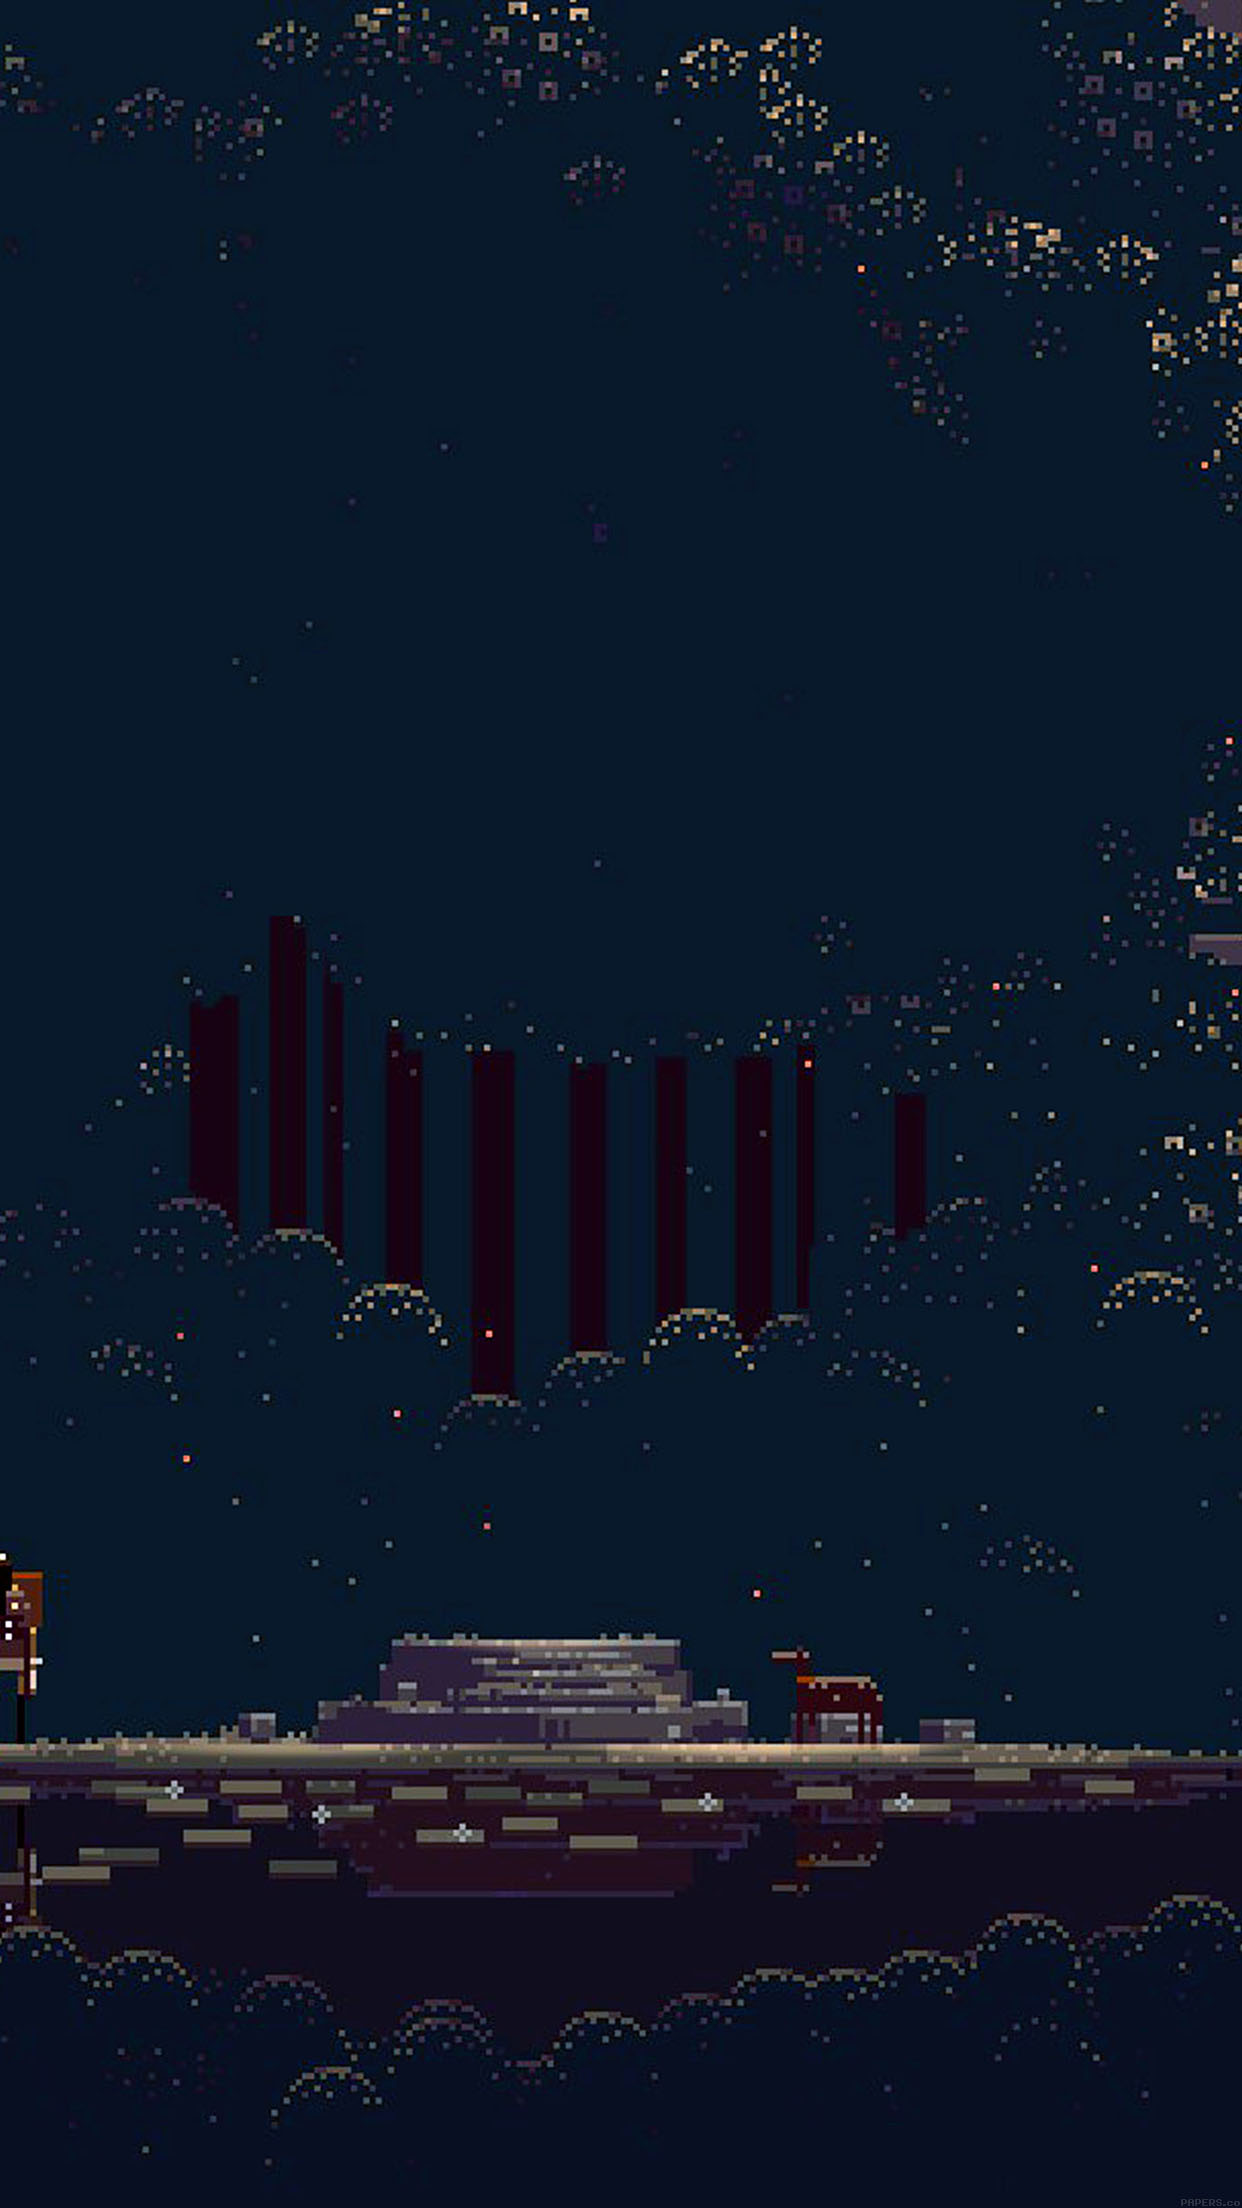 Free Download Wallpaper Pixelated Universe Game 34 Iphone6 Plus